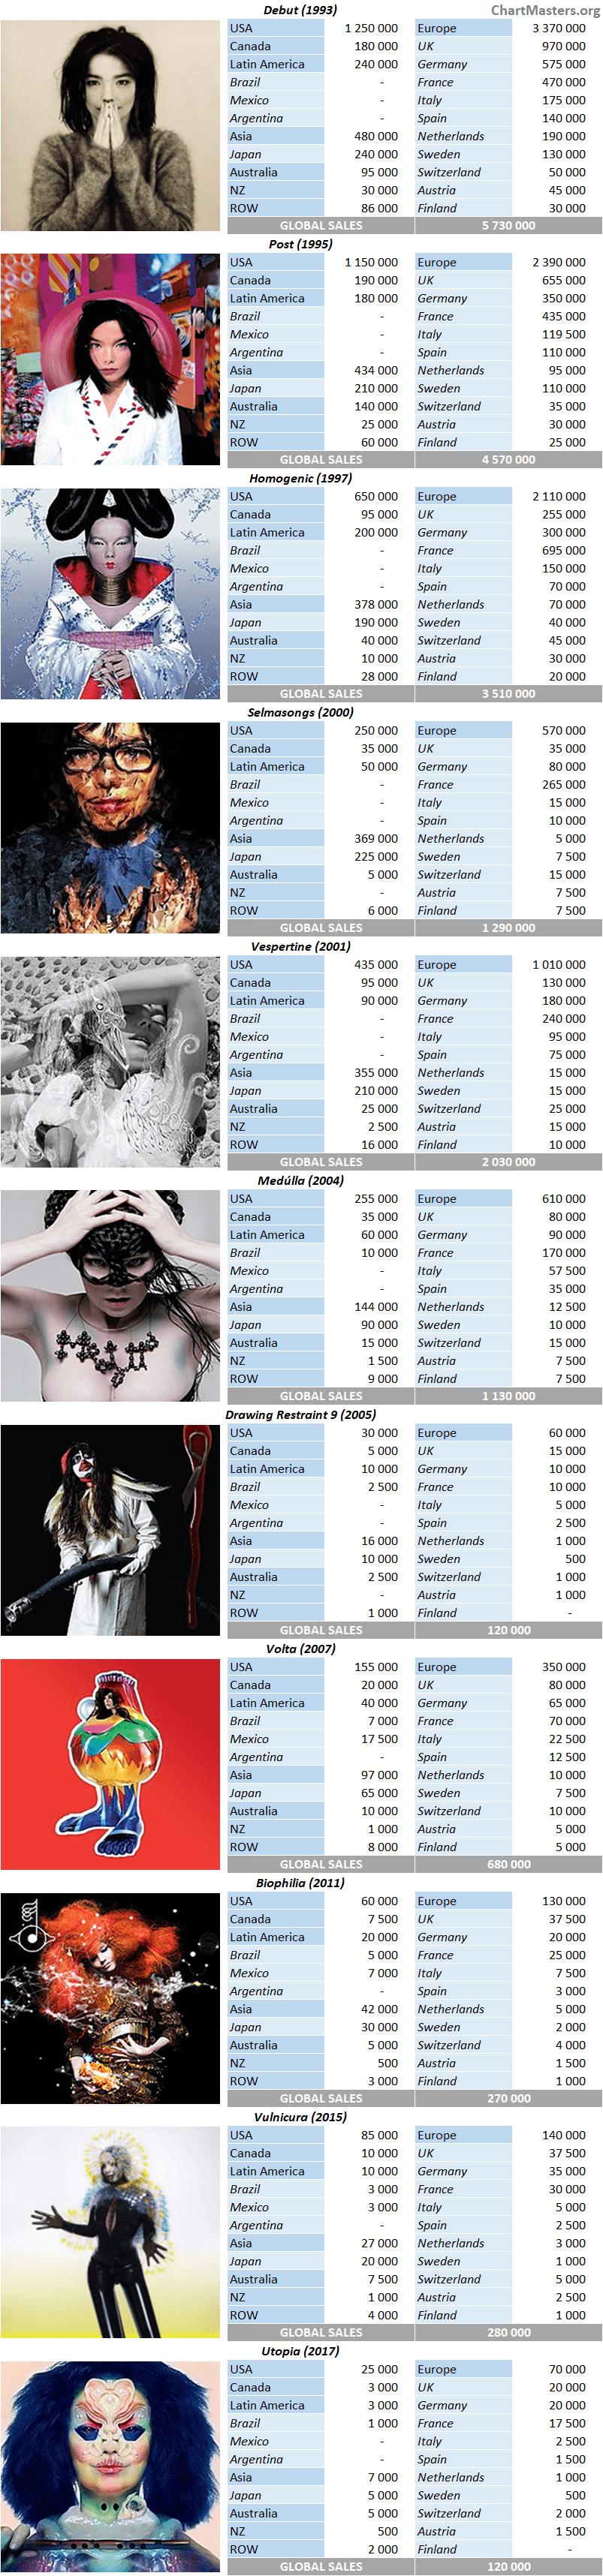 CSPC Bjork AlbumSales Breakdown By Market